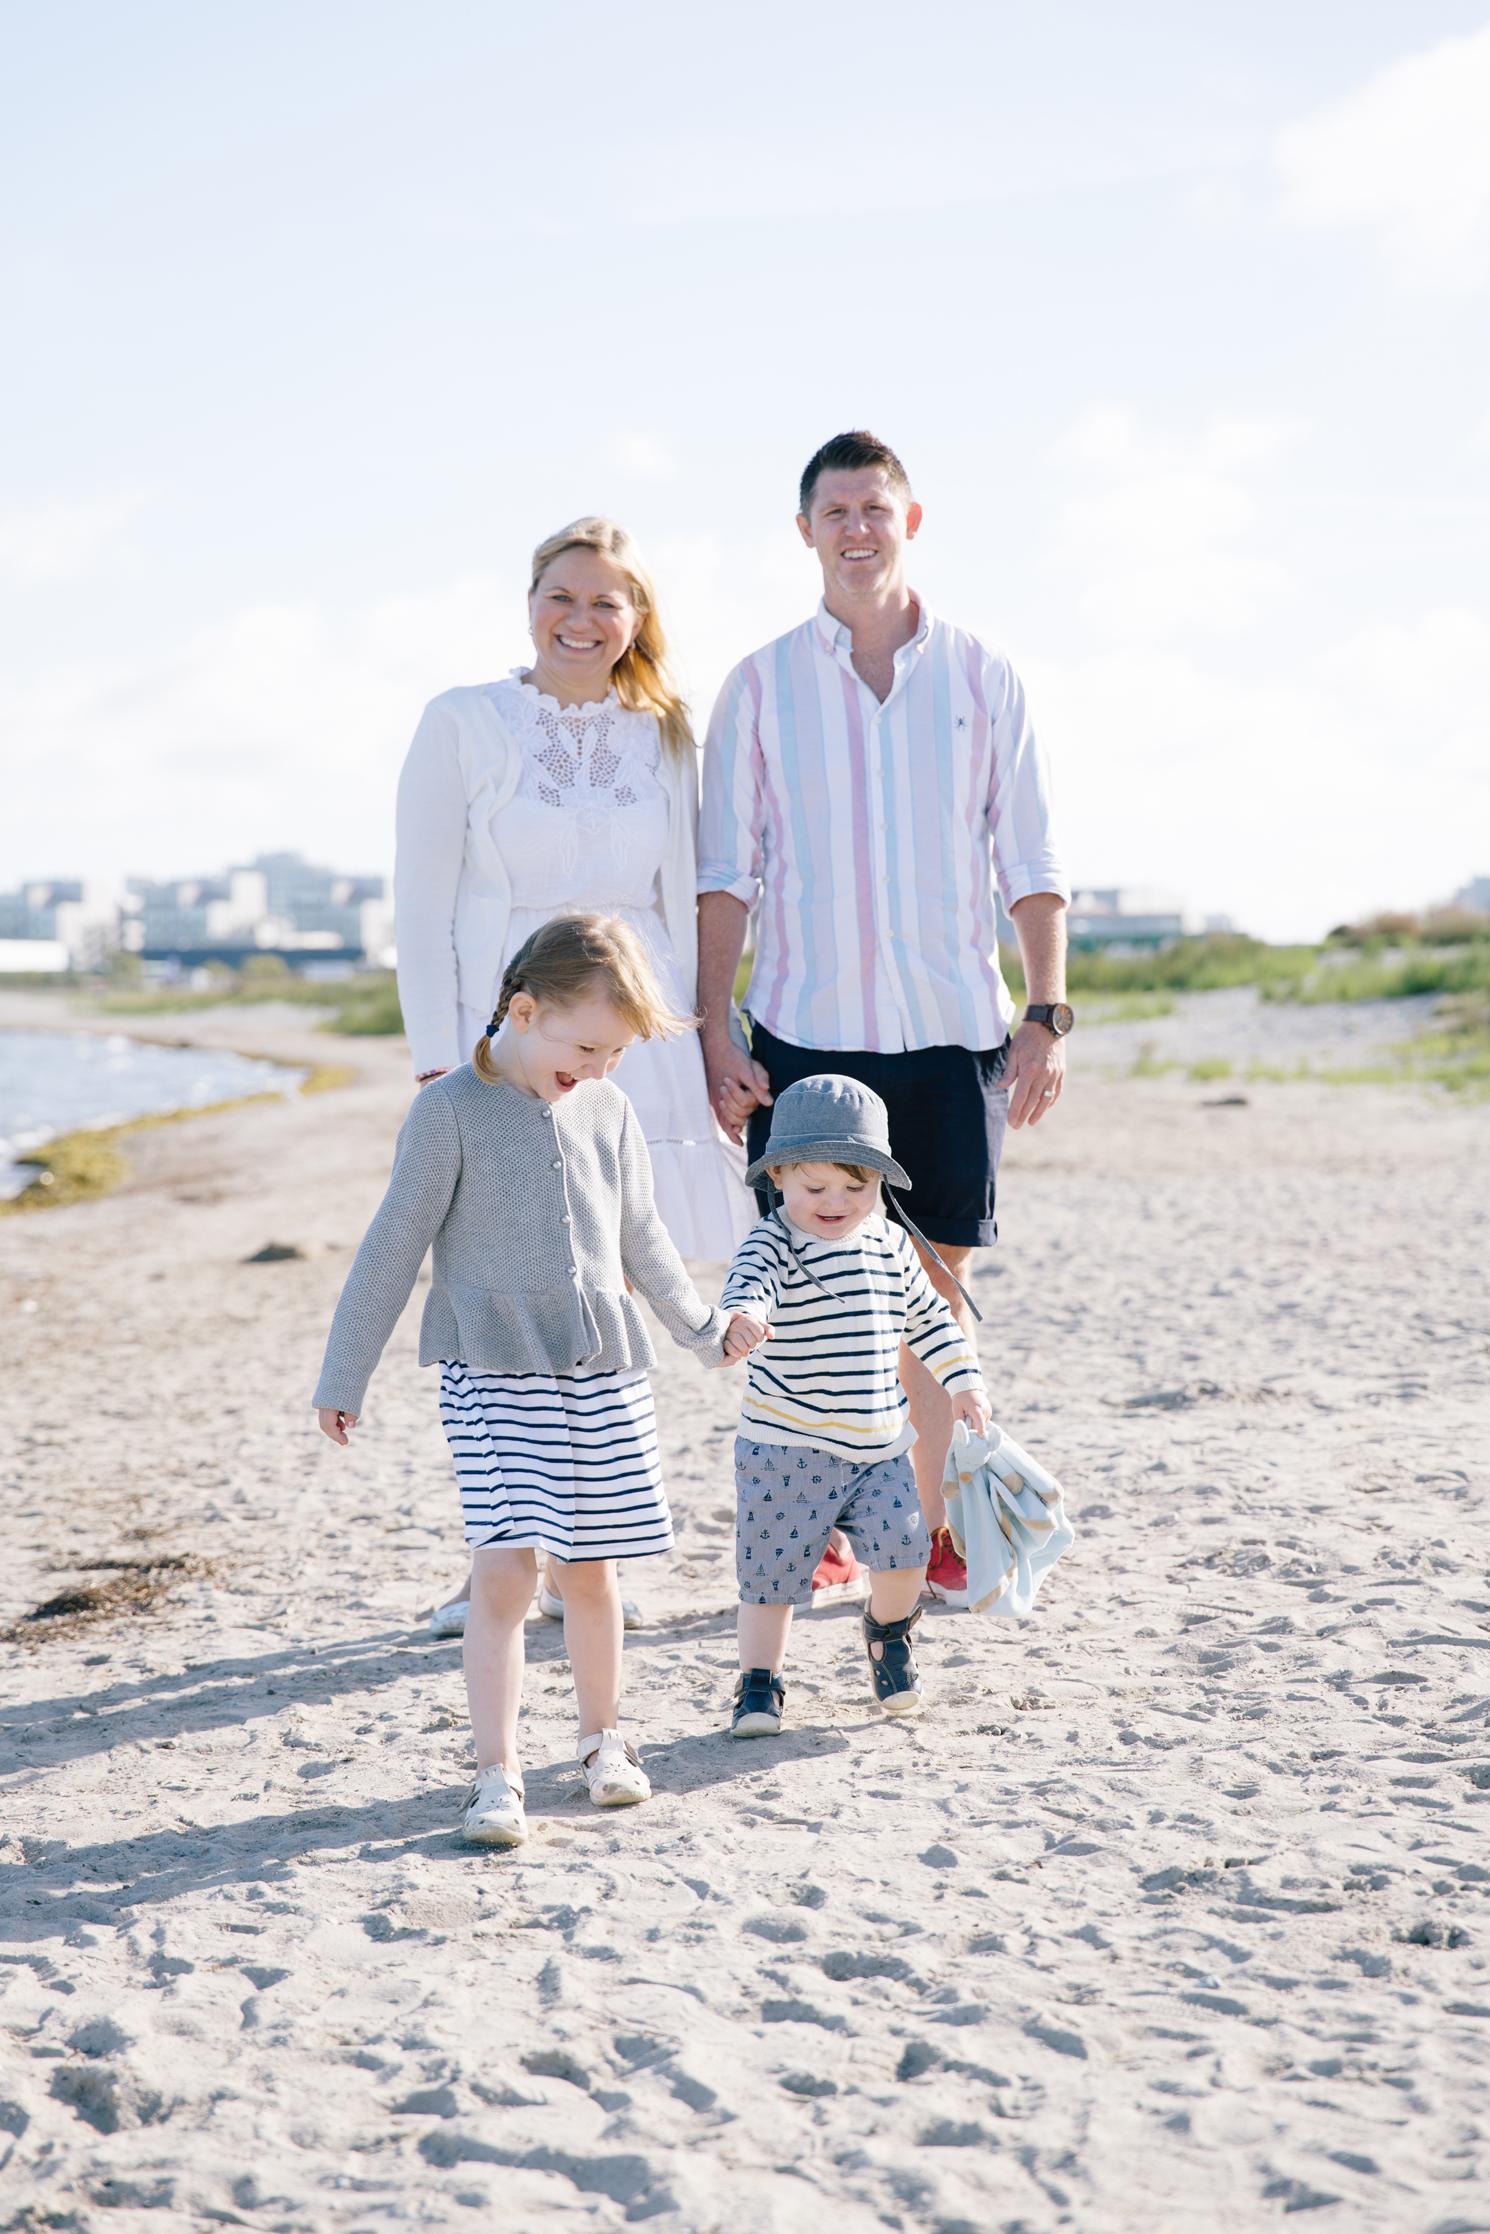 familjefotografering-malmo-kallbadhuset-maria-o-photo-lek-gladje-karlek-7